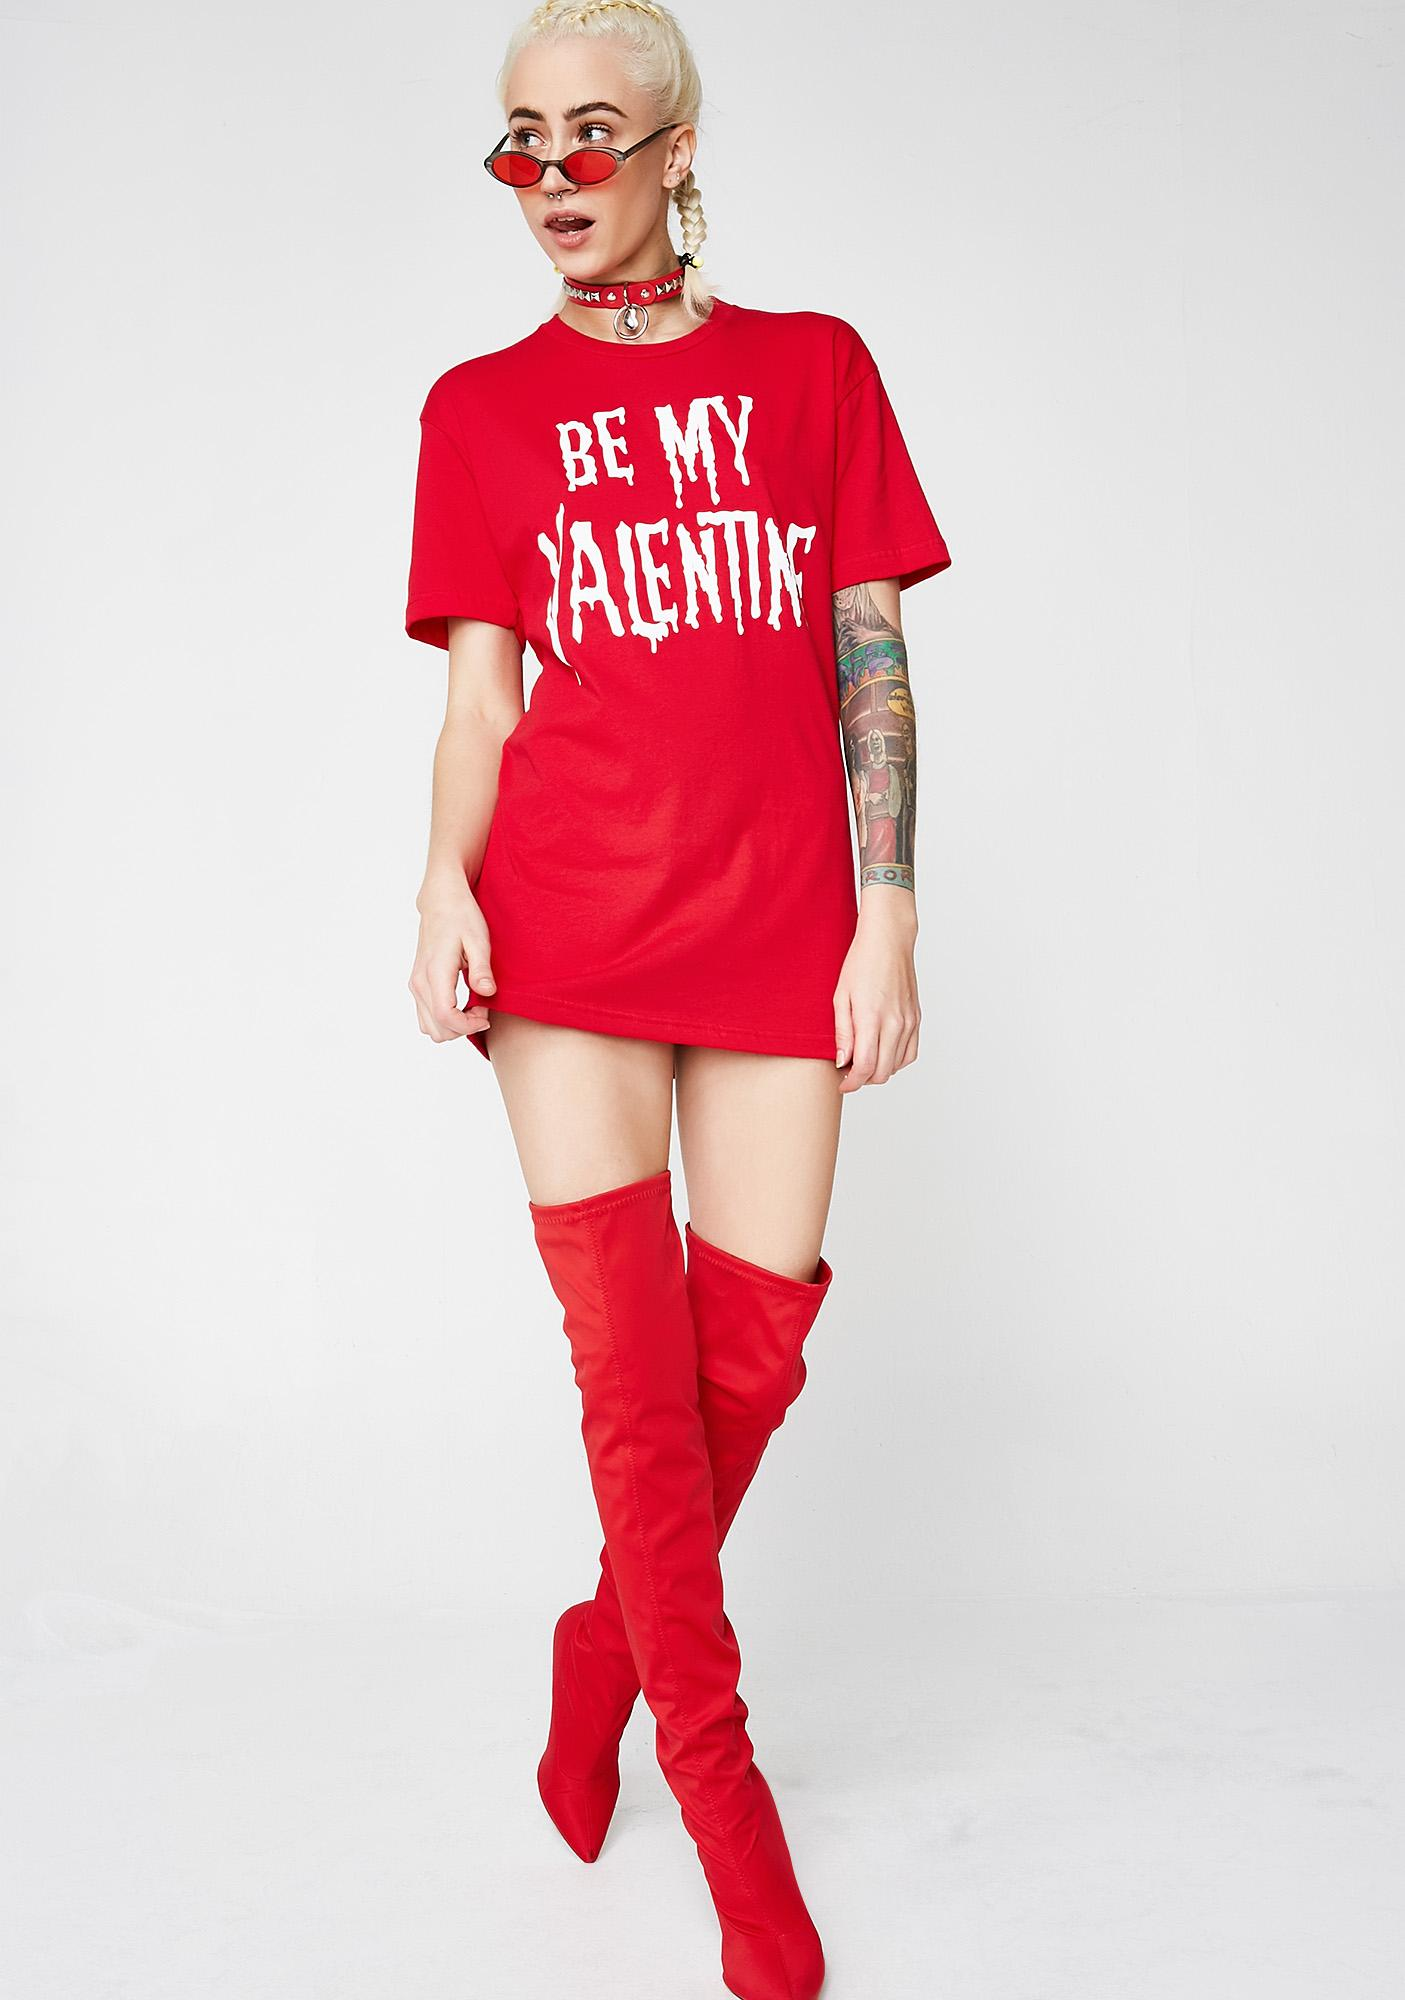 Be My Bloody Valentine Tee